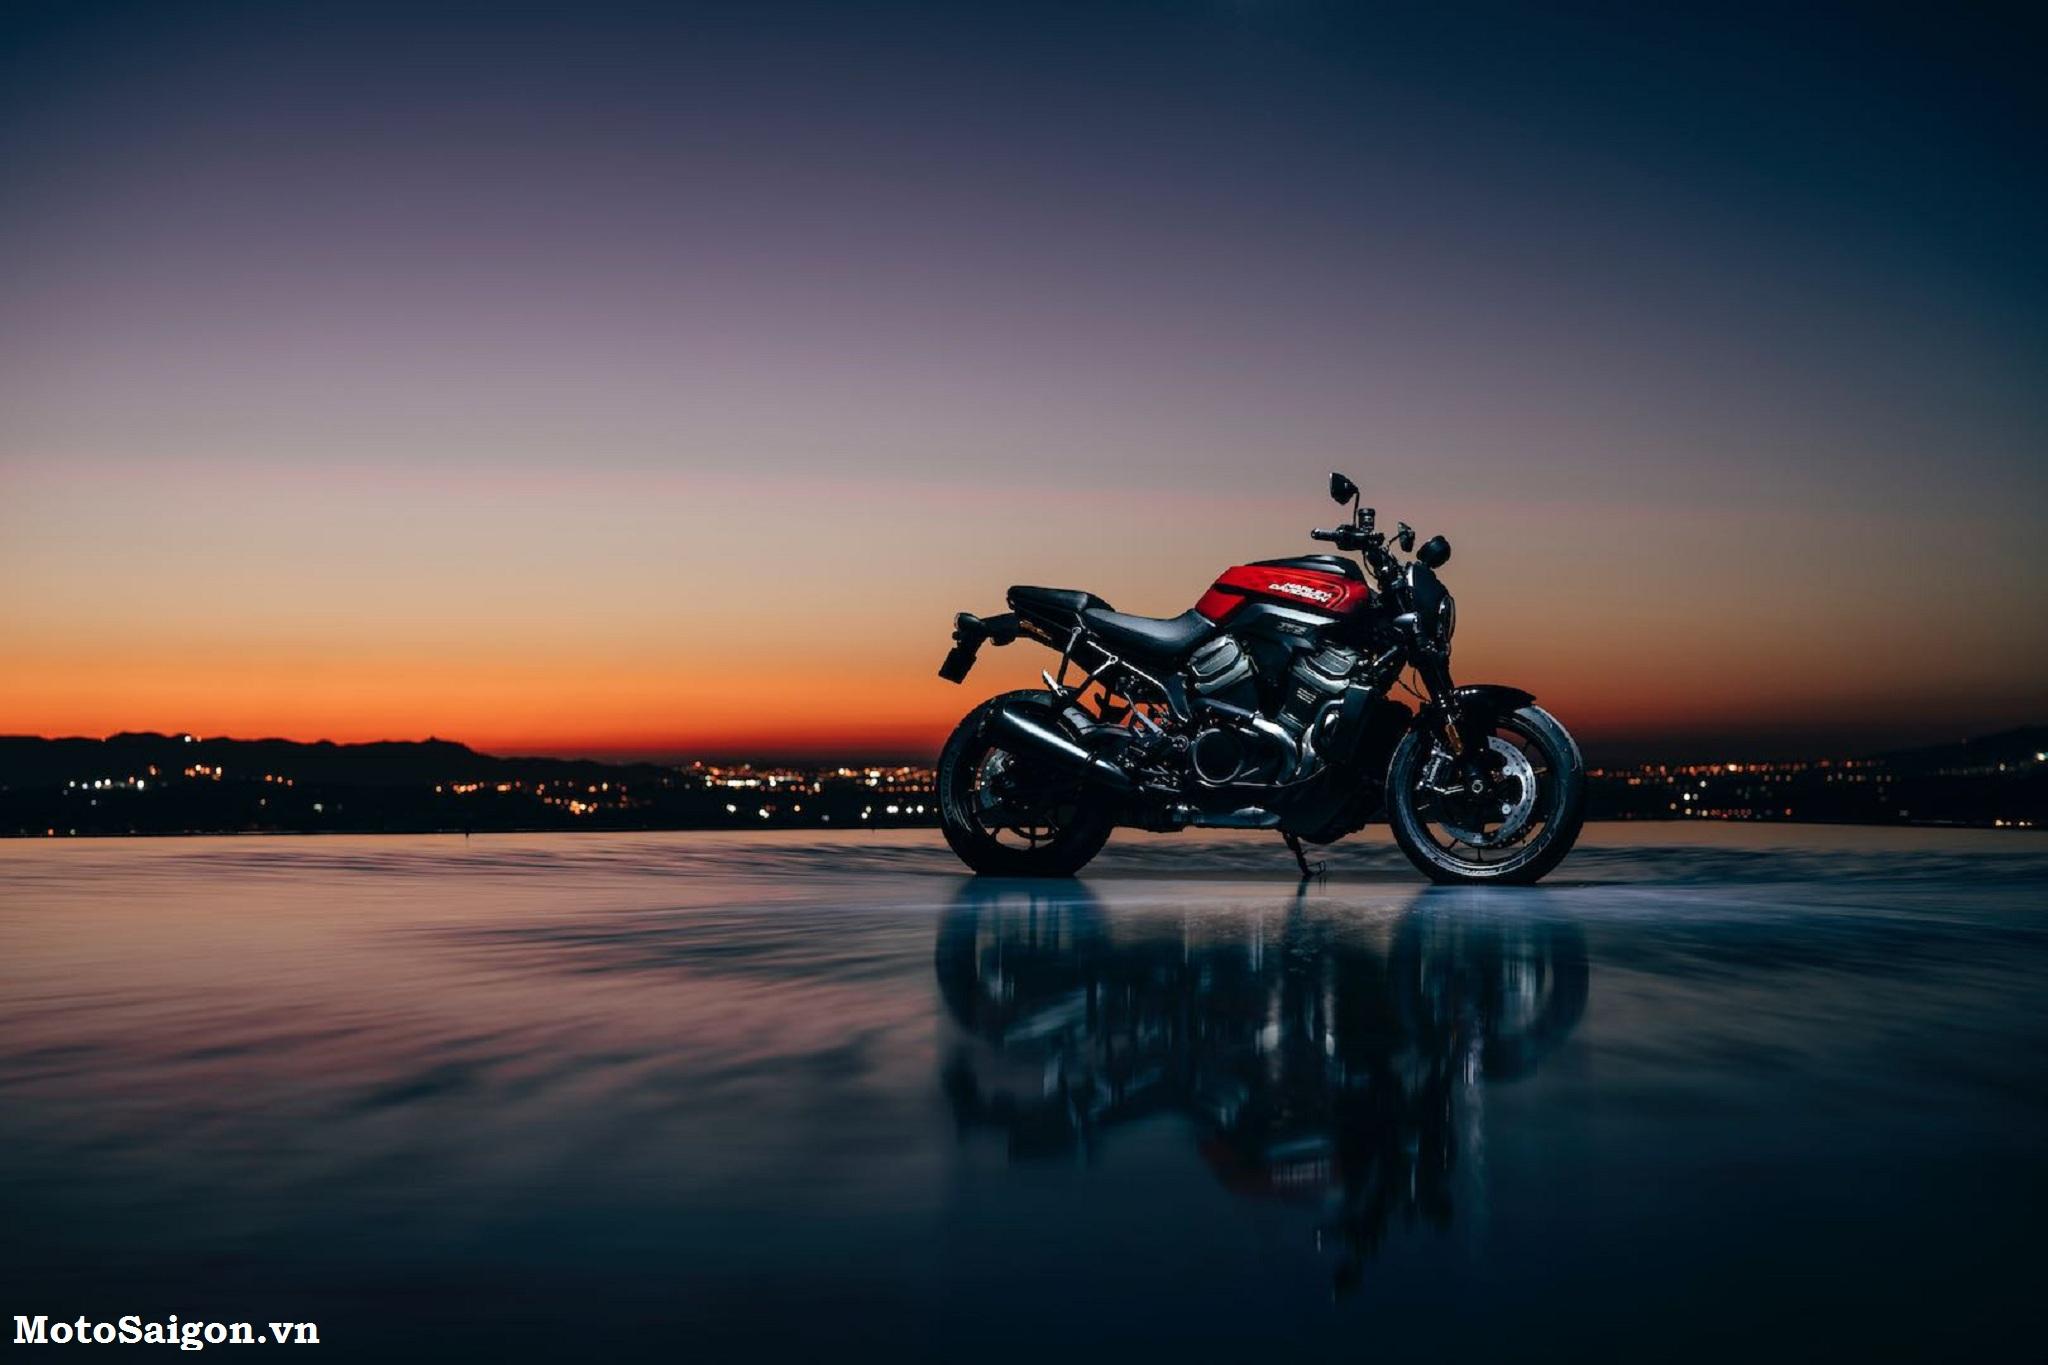 Mẫu xe mô tô Harley-Davidson Bronx Streetfighter 2021